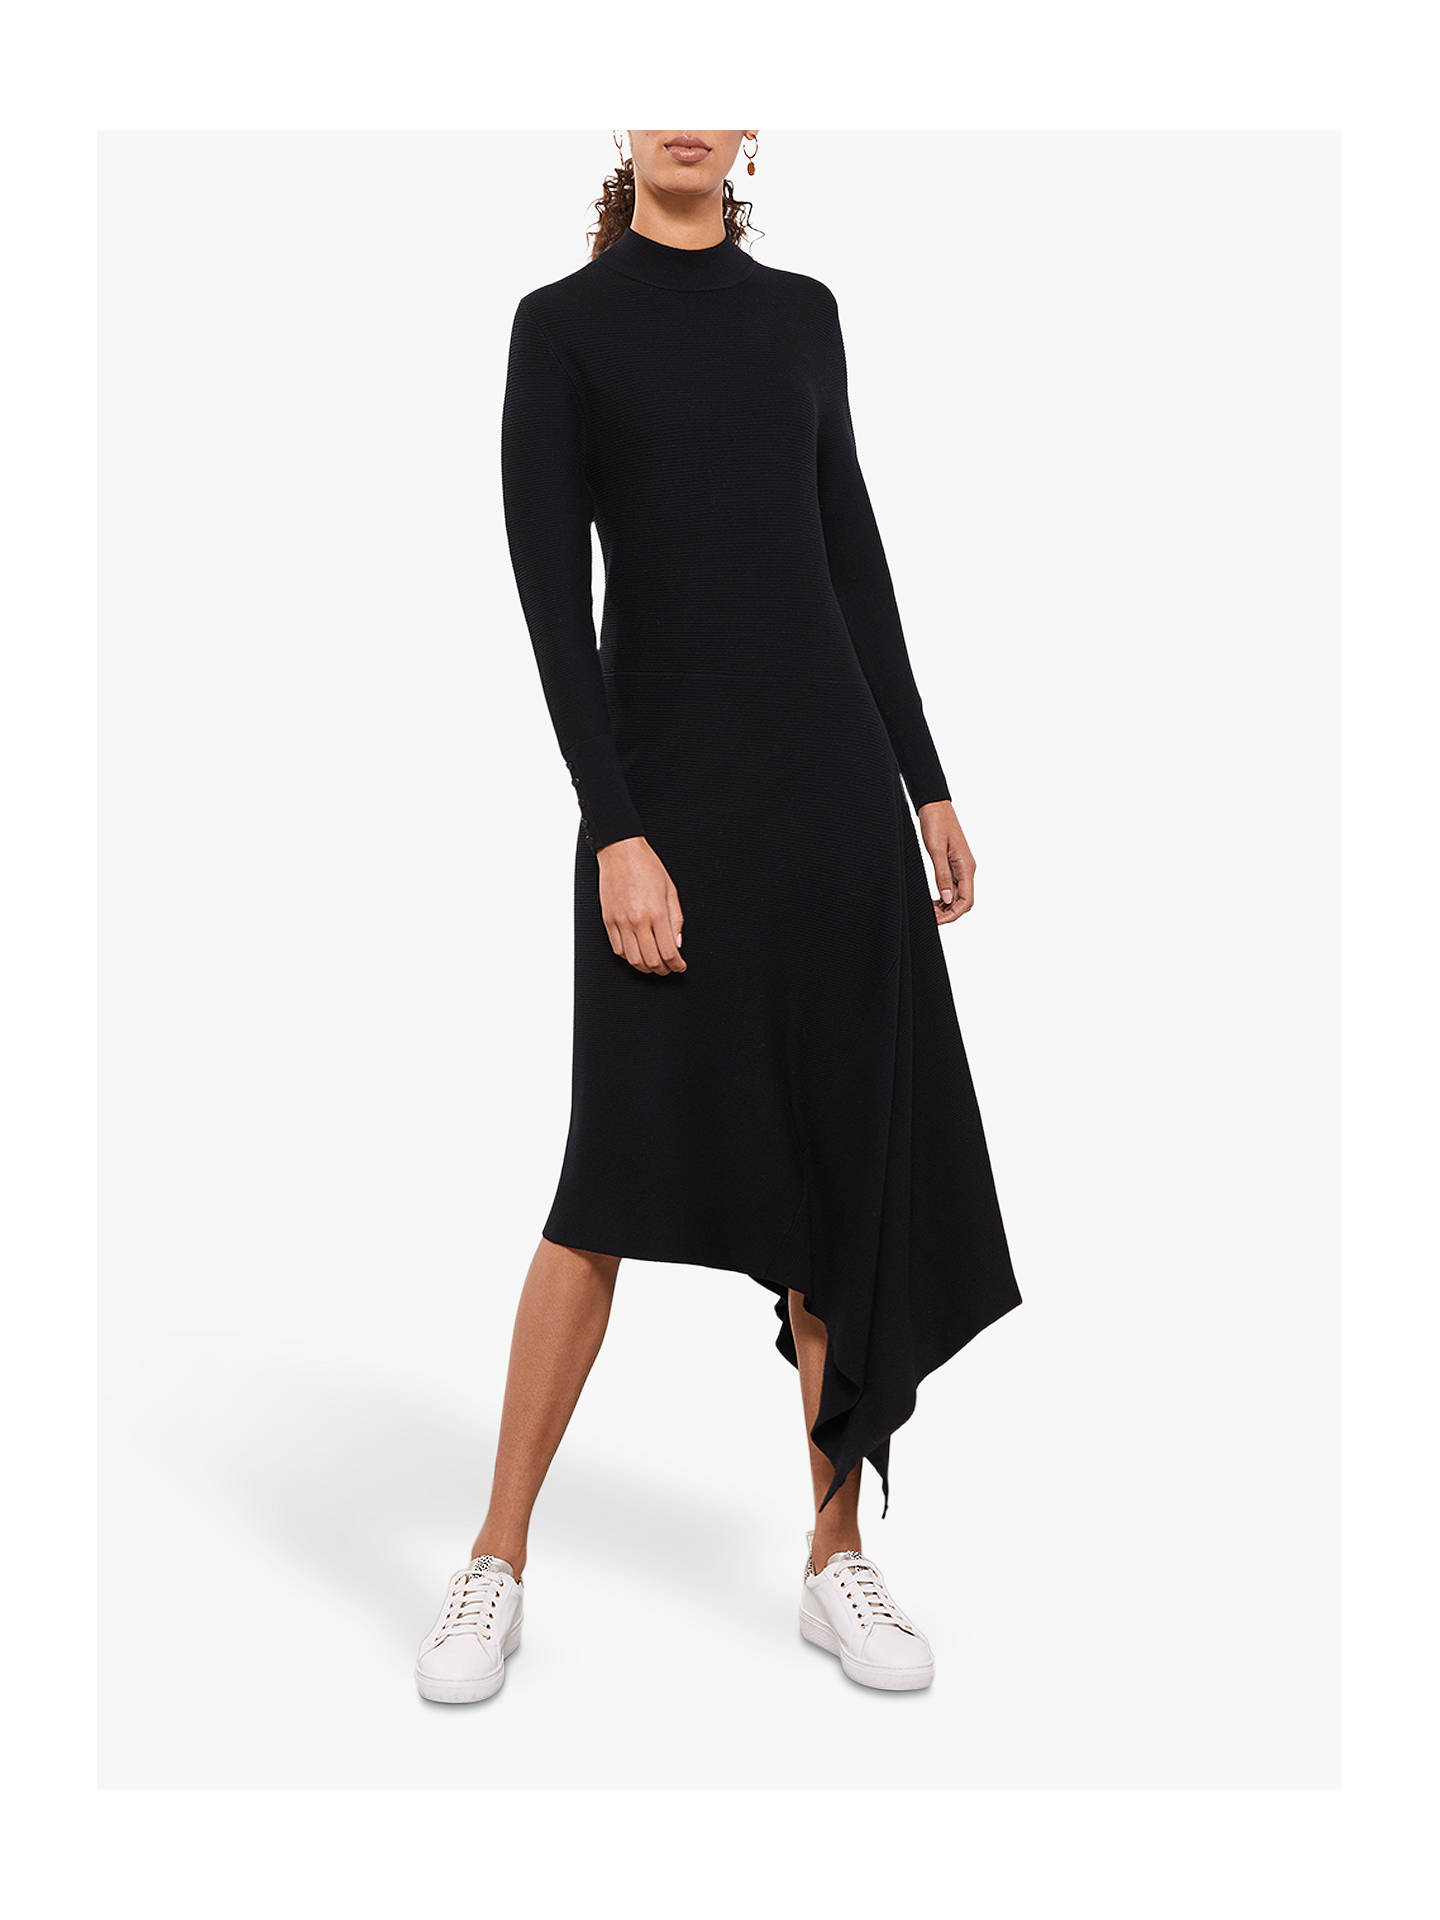 wholesale dealer hot sale online professional Mint Velvet Midi Jumper Dress, Black